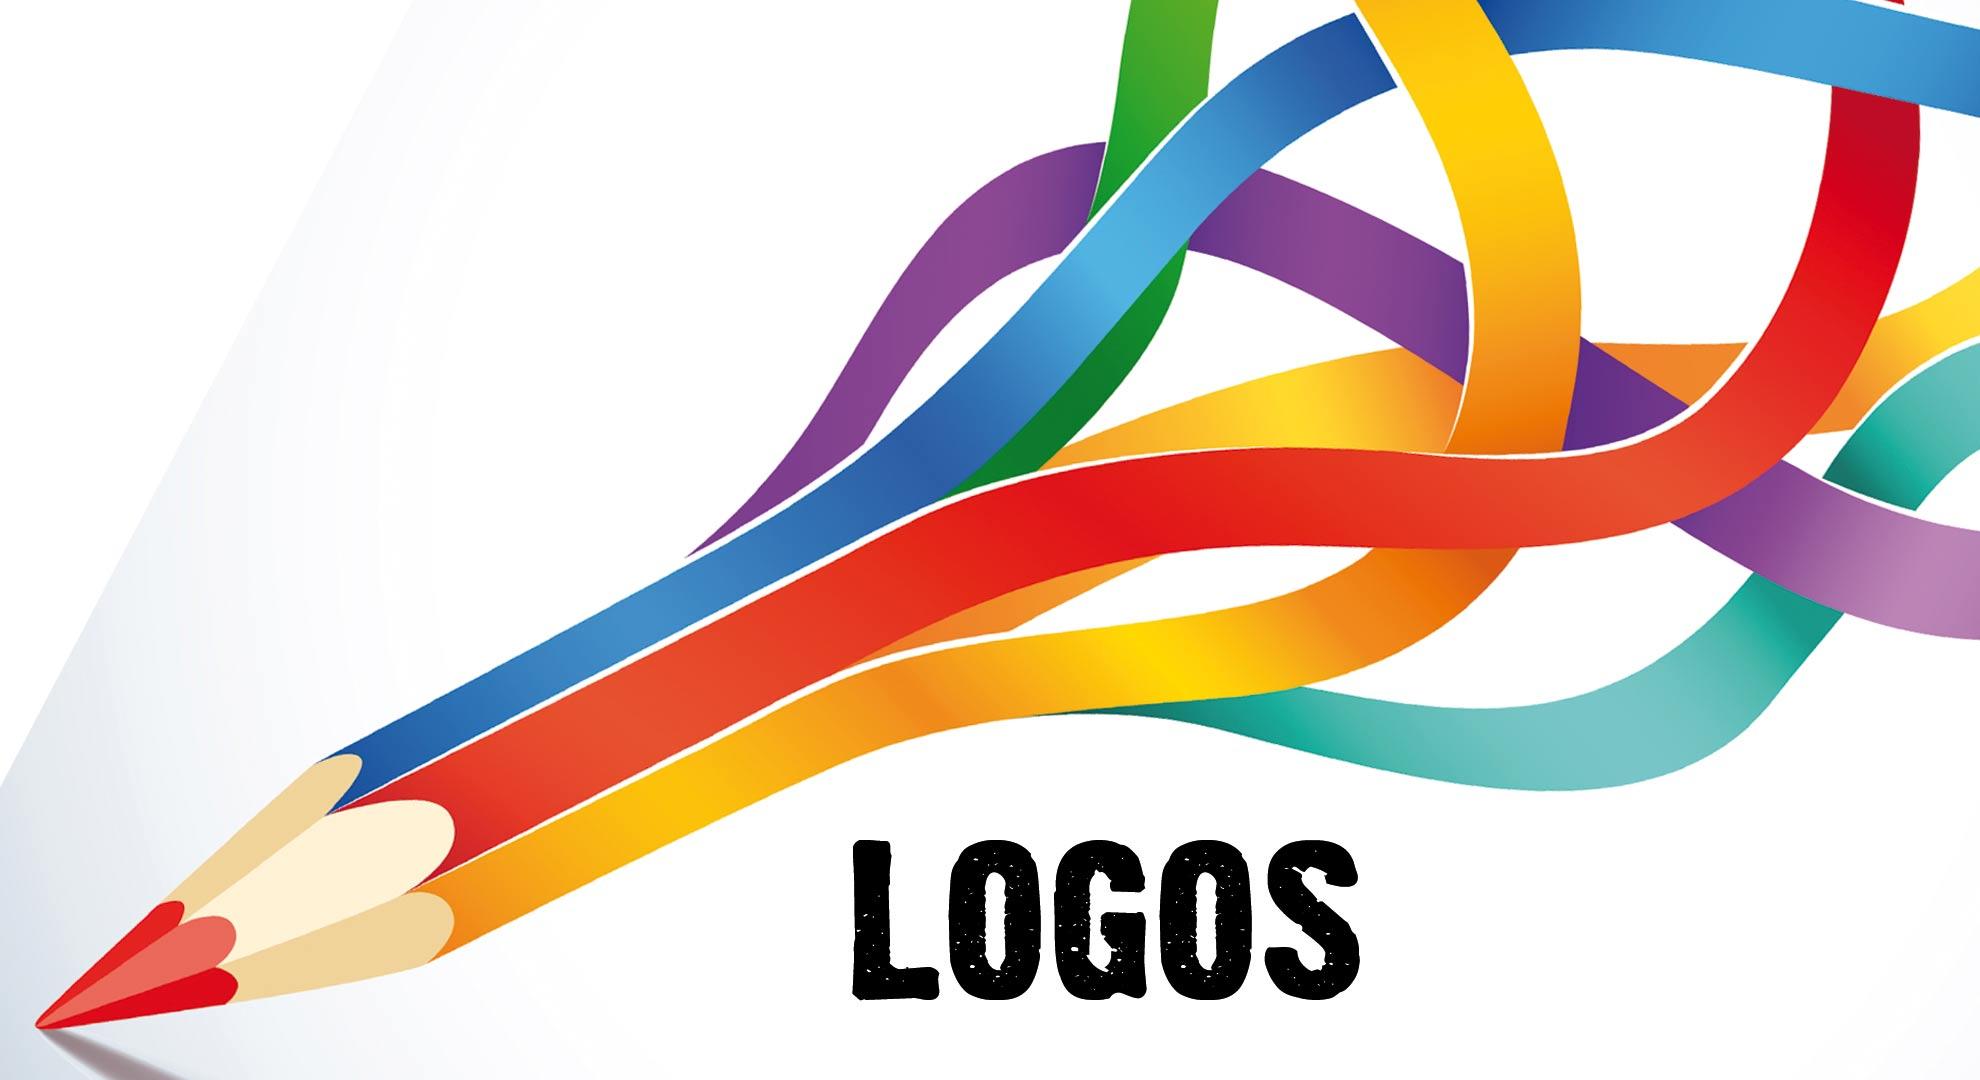 Hiring-a-good-logo-designing-company-to-create-your-logo